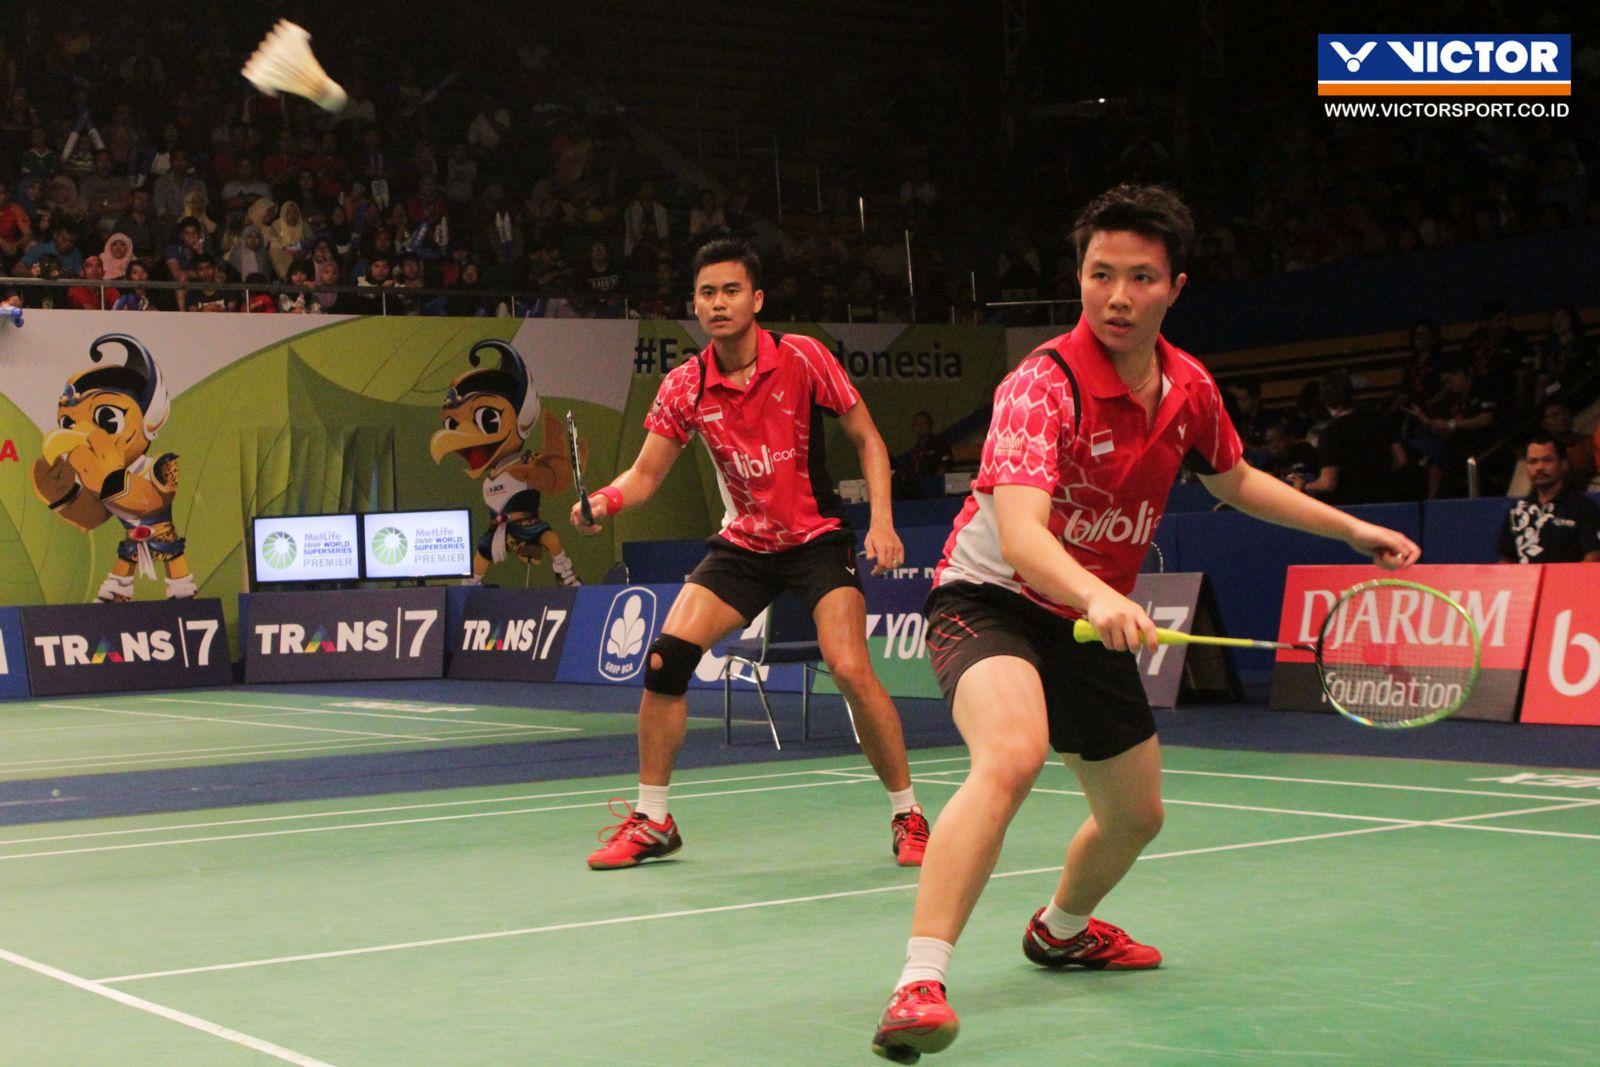 Indonesia Open 2015 Tontowi Ahmad Liliyana Natsir sukses